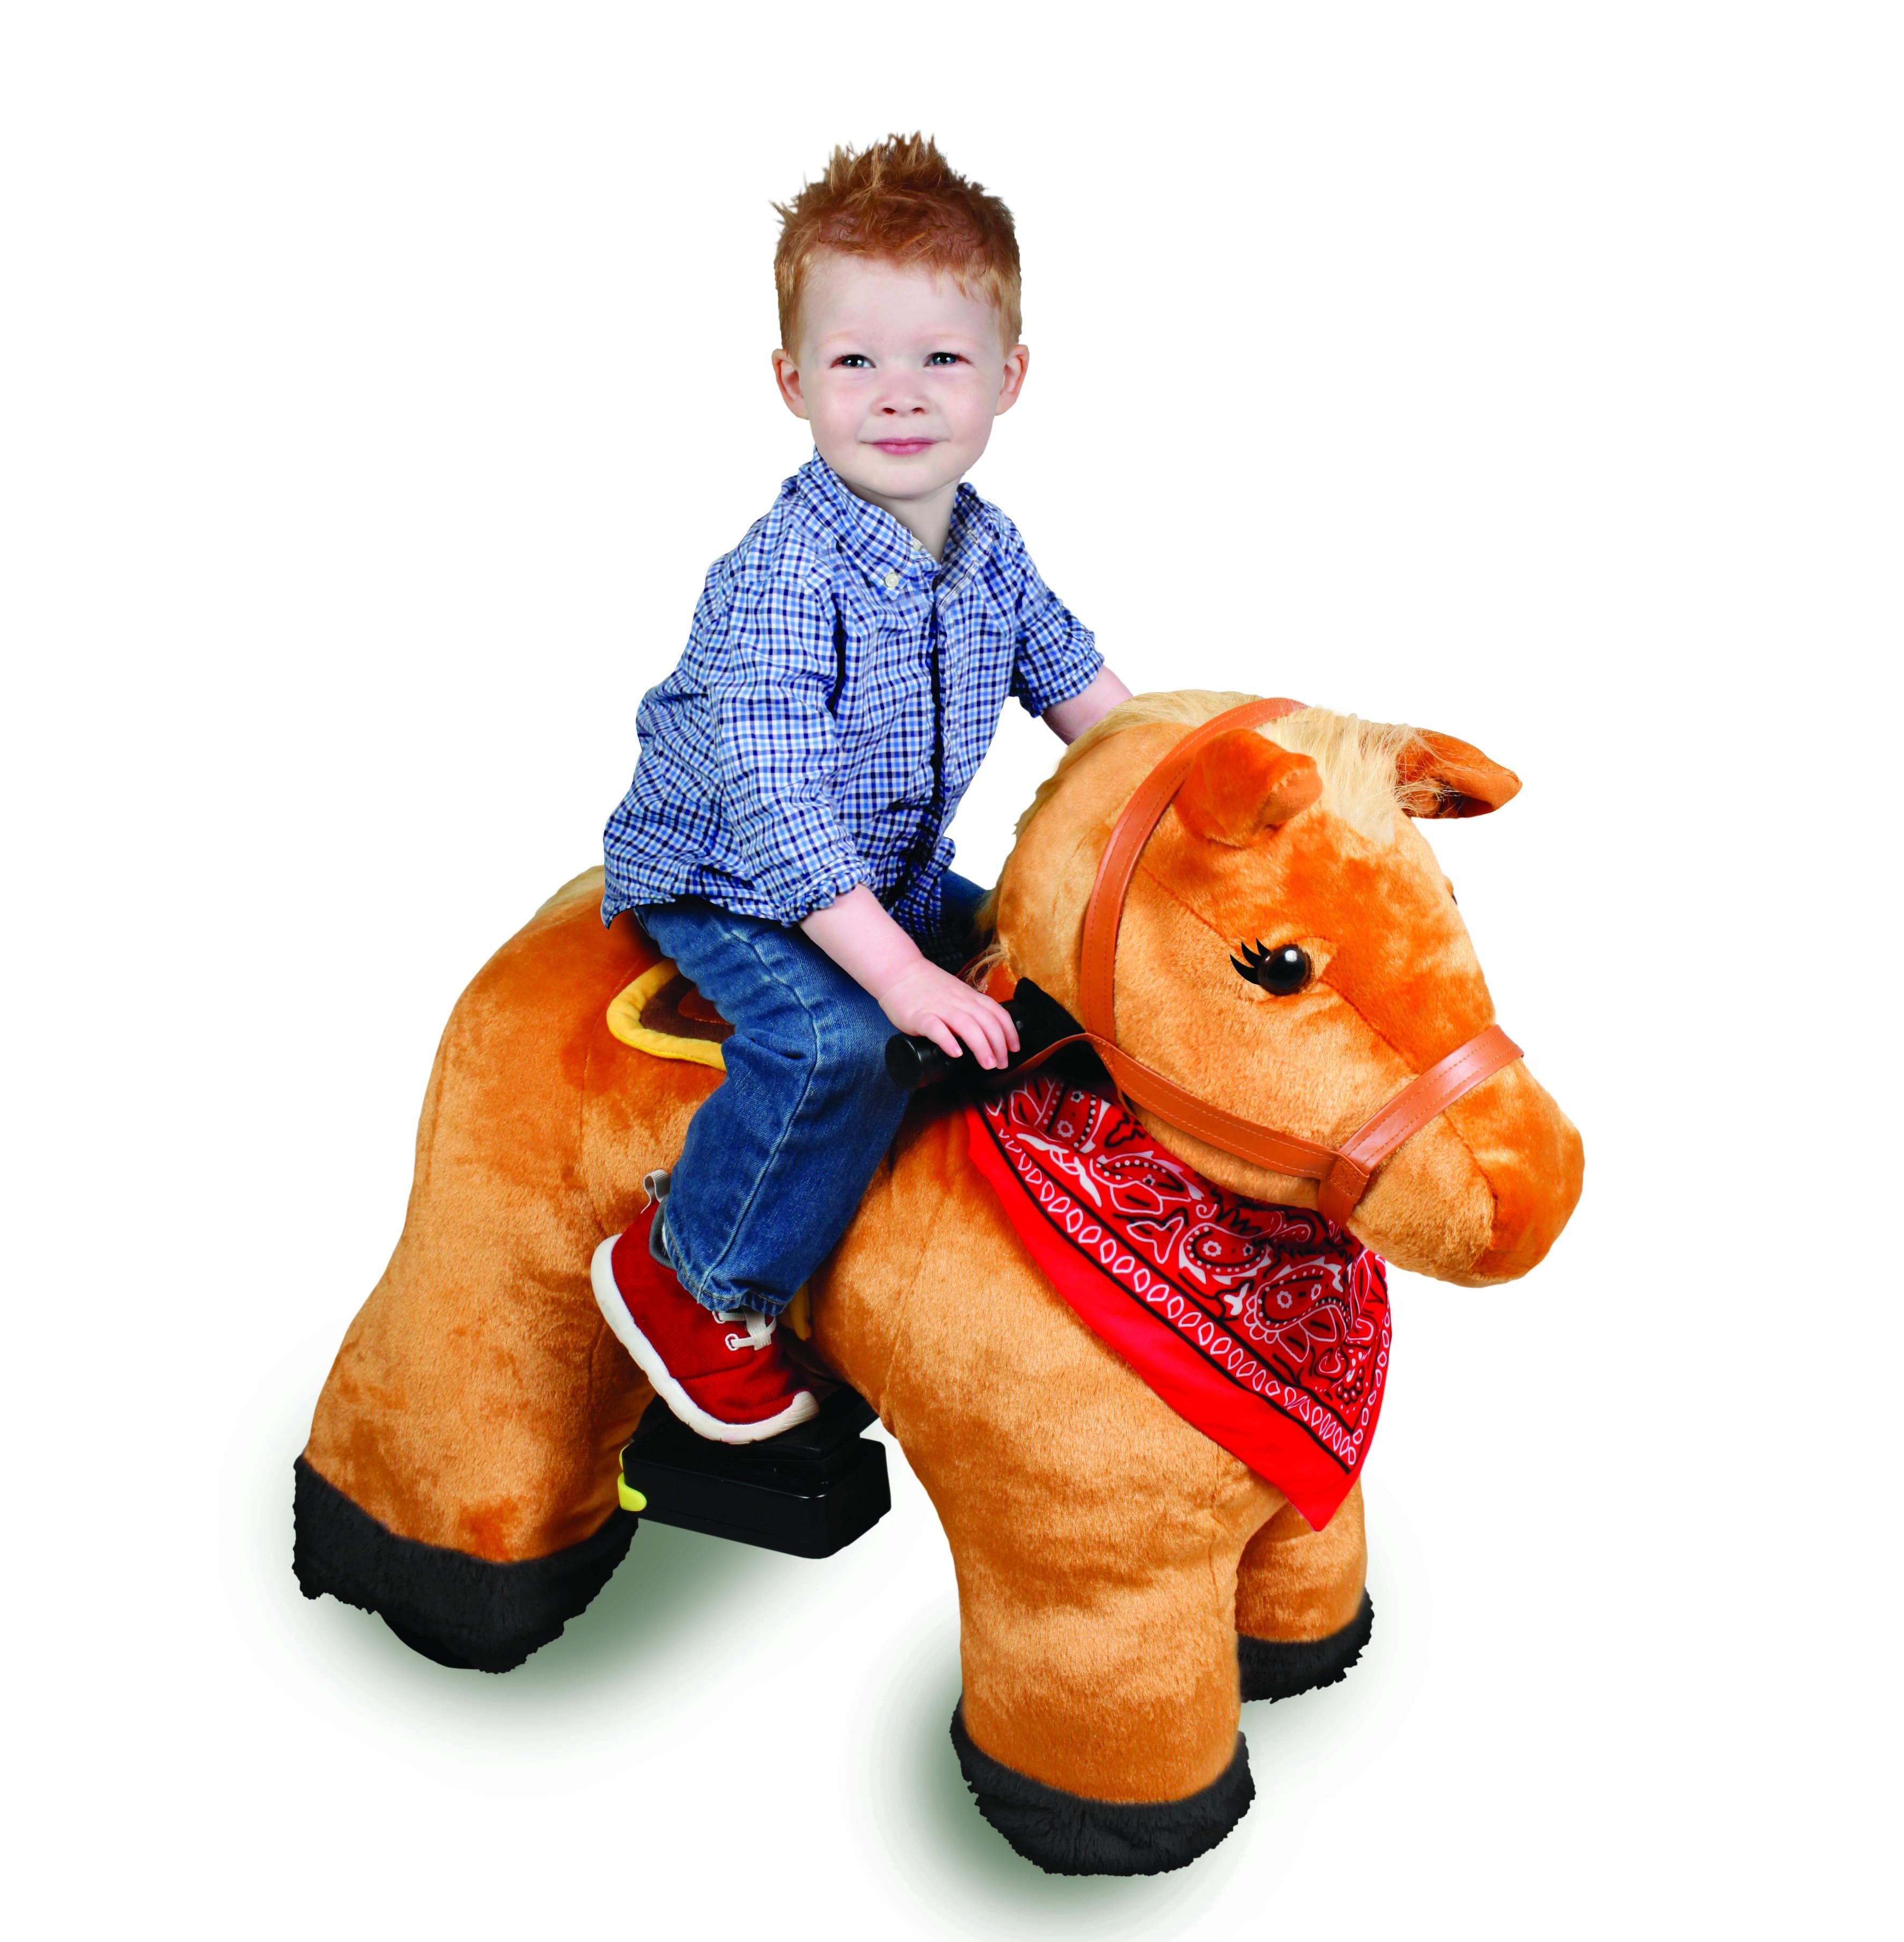 6V Stable Buddies Chestnut Horse Plush Ride-On by ... - photo#48